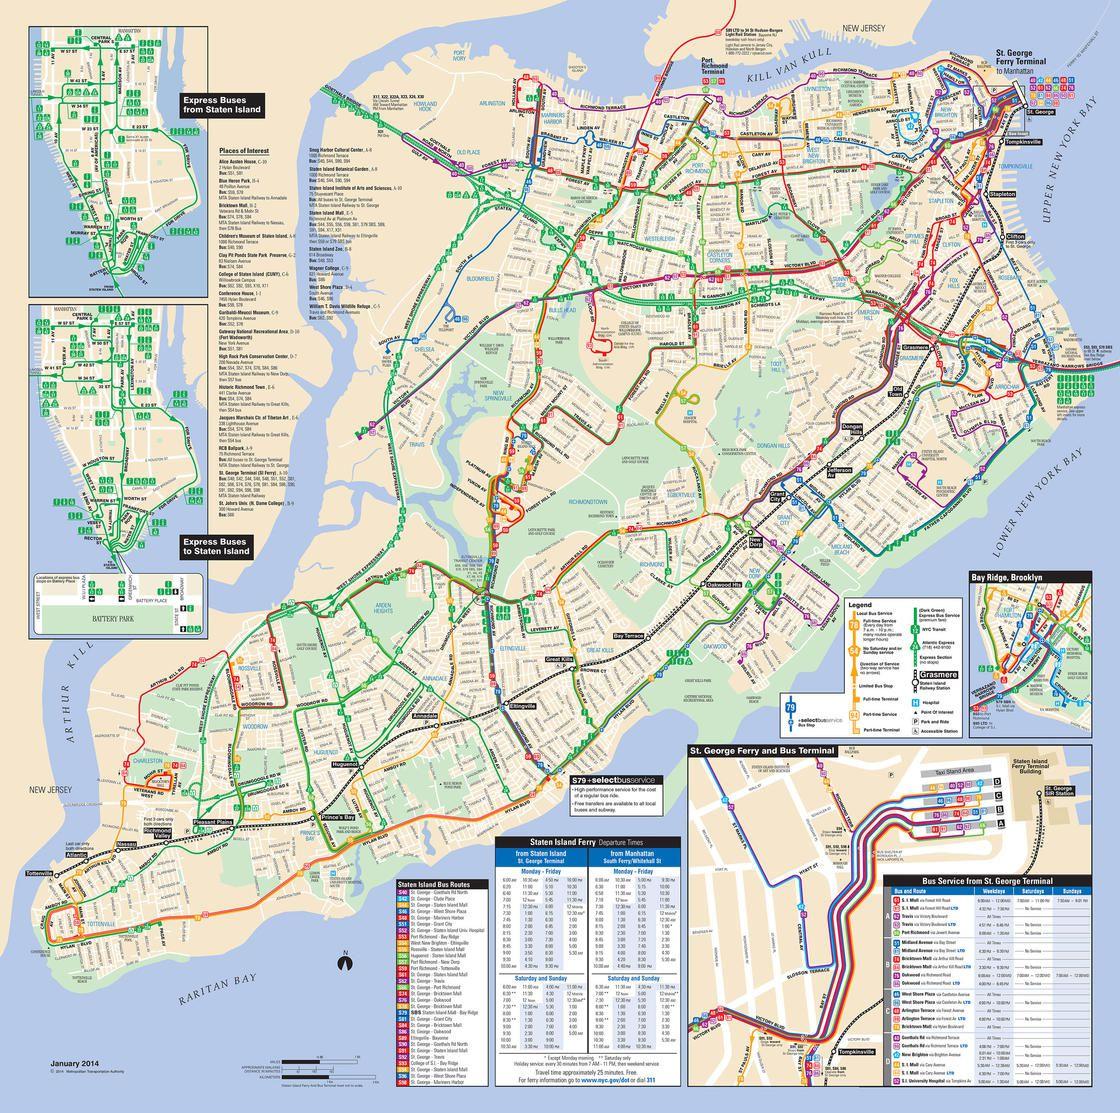 Plan du bus à Staten Island